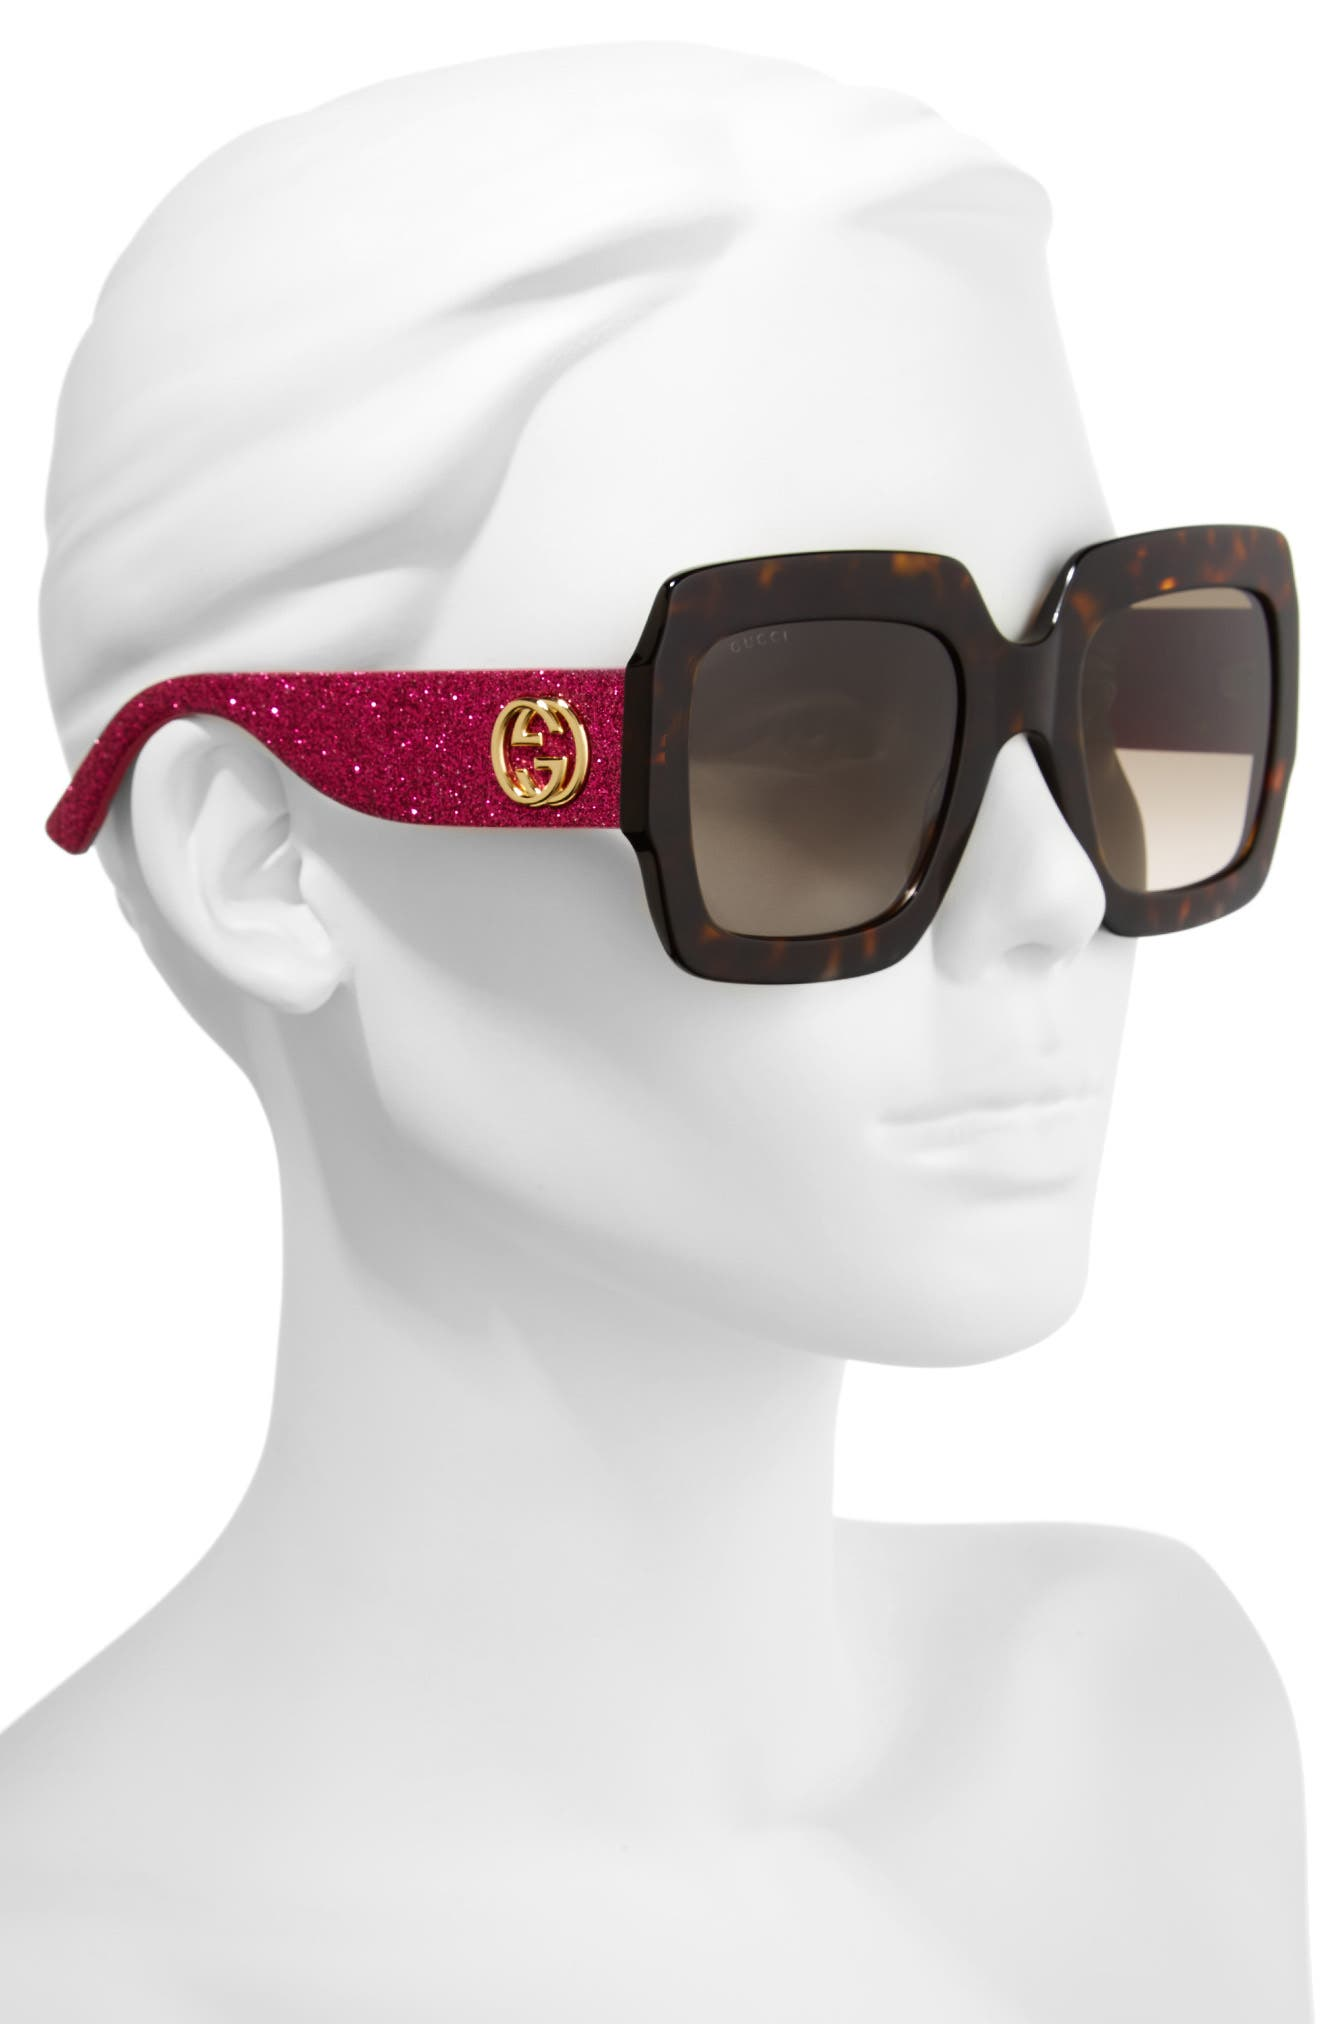 54mm Square Sunglasses,                             Alternate thumbnail 2, color,                             Havana/ Brown